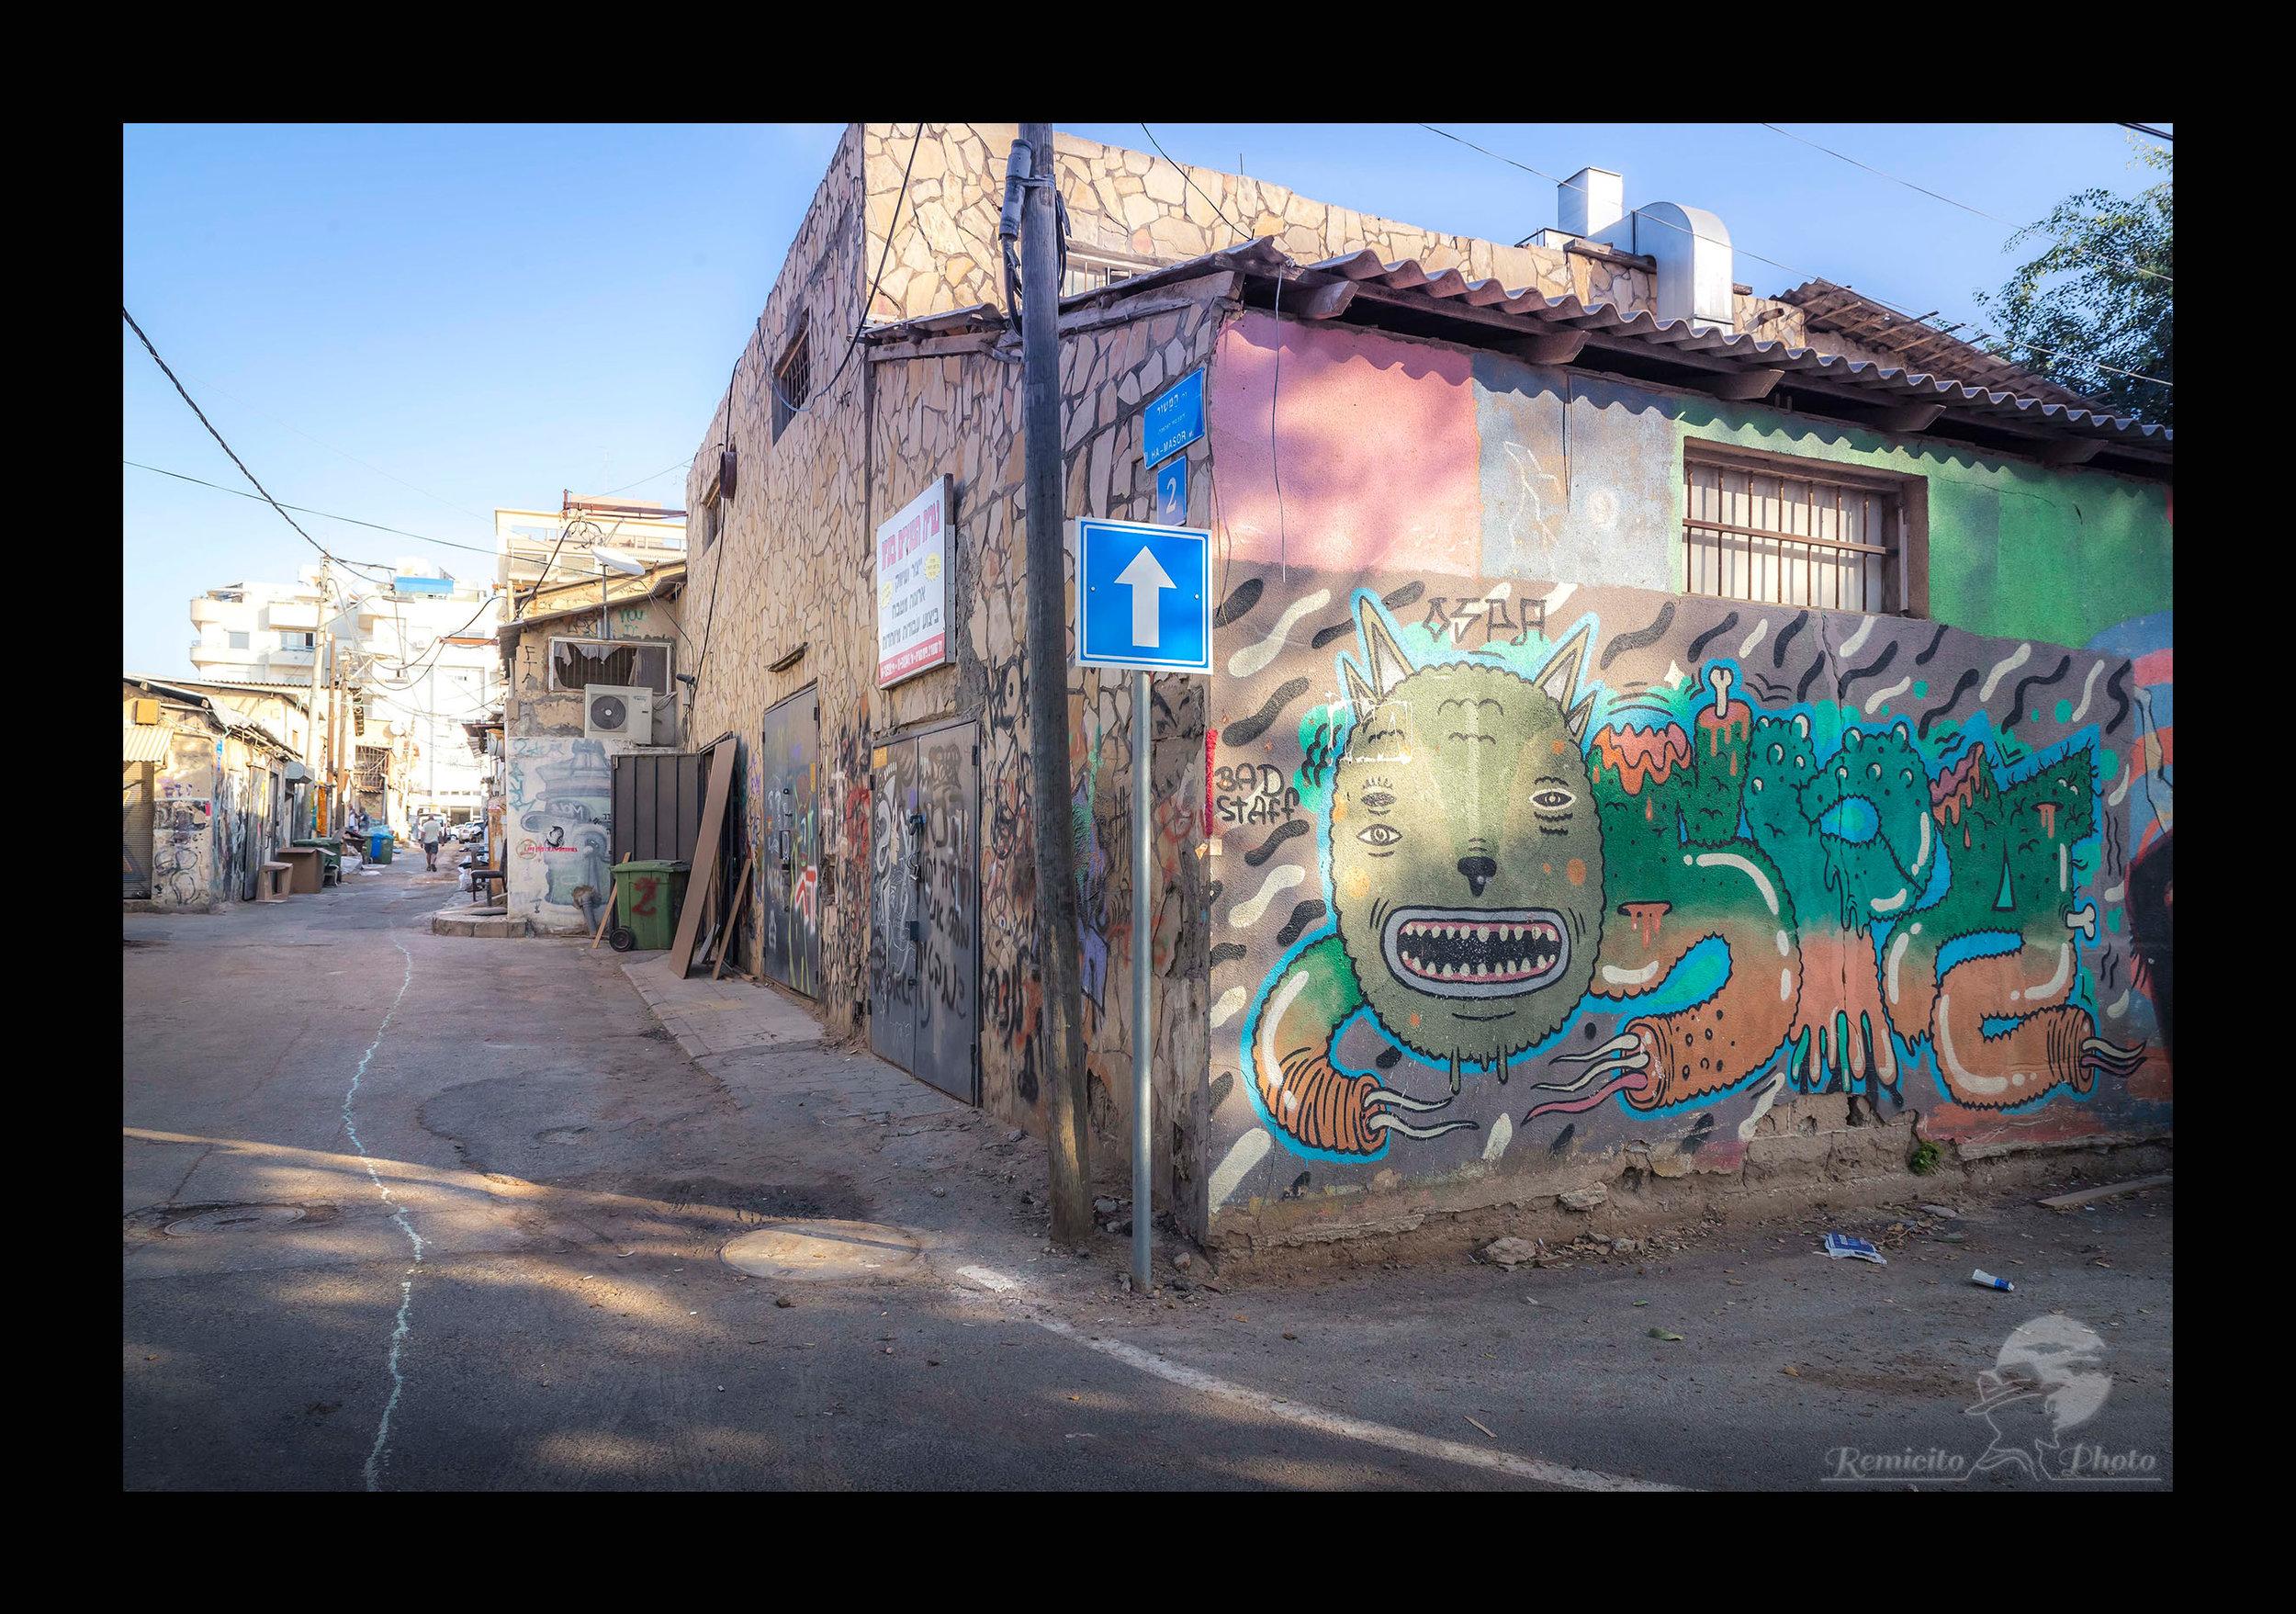 remicito photo, image du jour, photo du jour, voyage Israël, trip Israel, photo voyage Tel Aviv, Street Art, Graffiti, Graffiti Israel